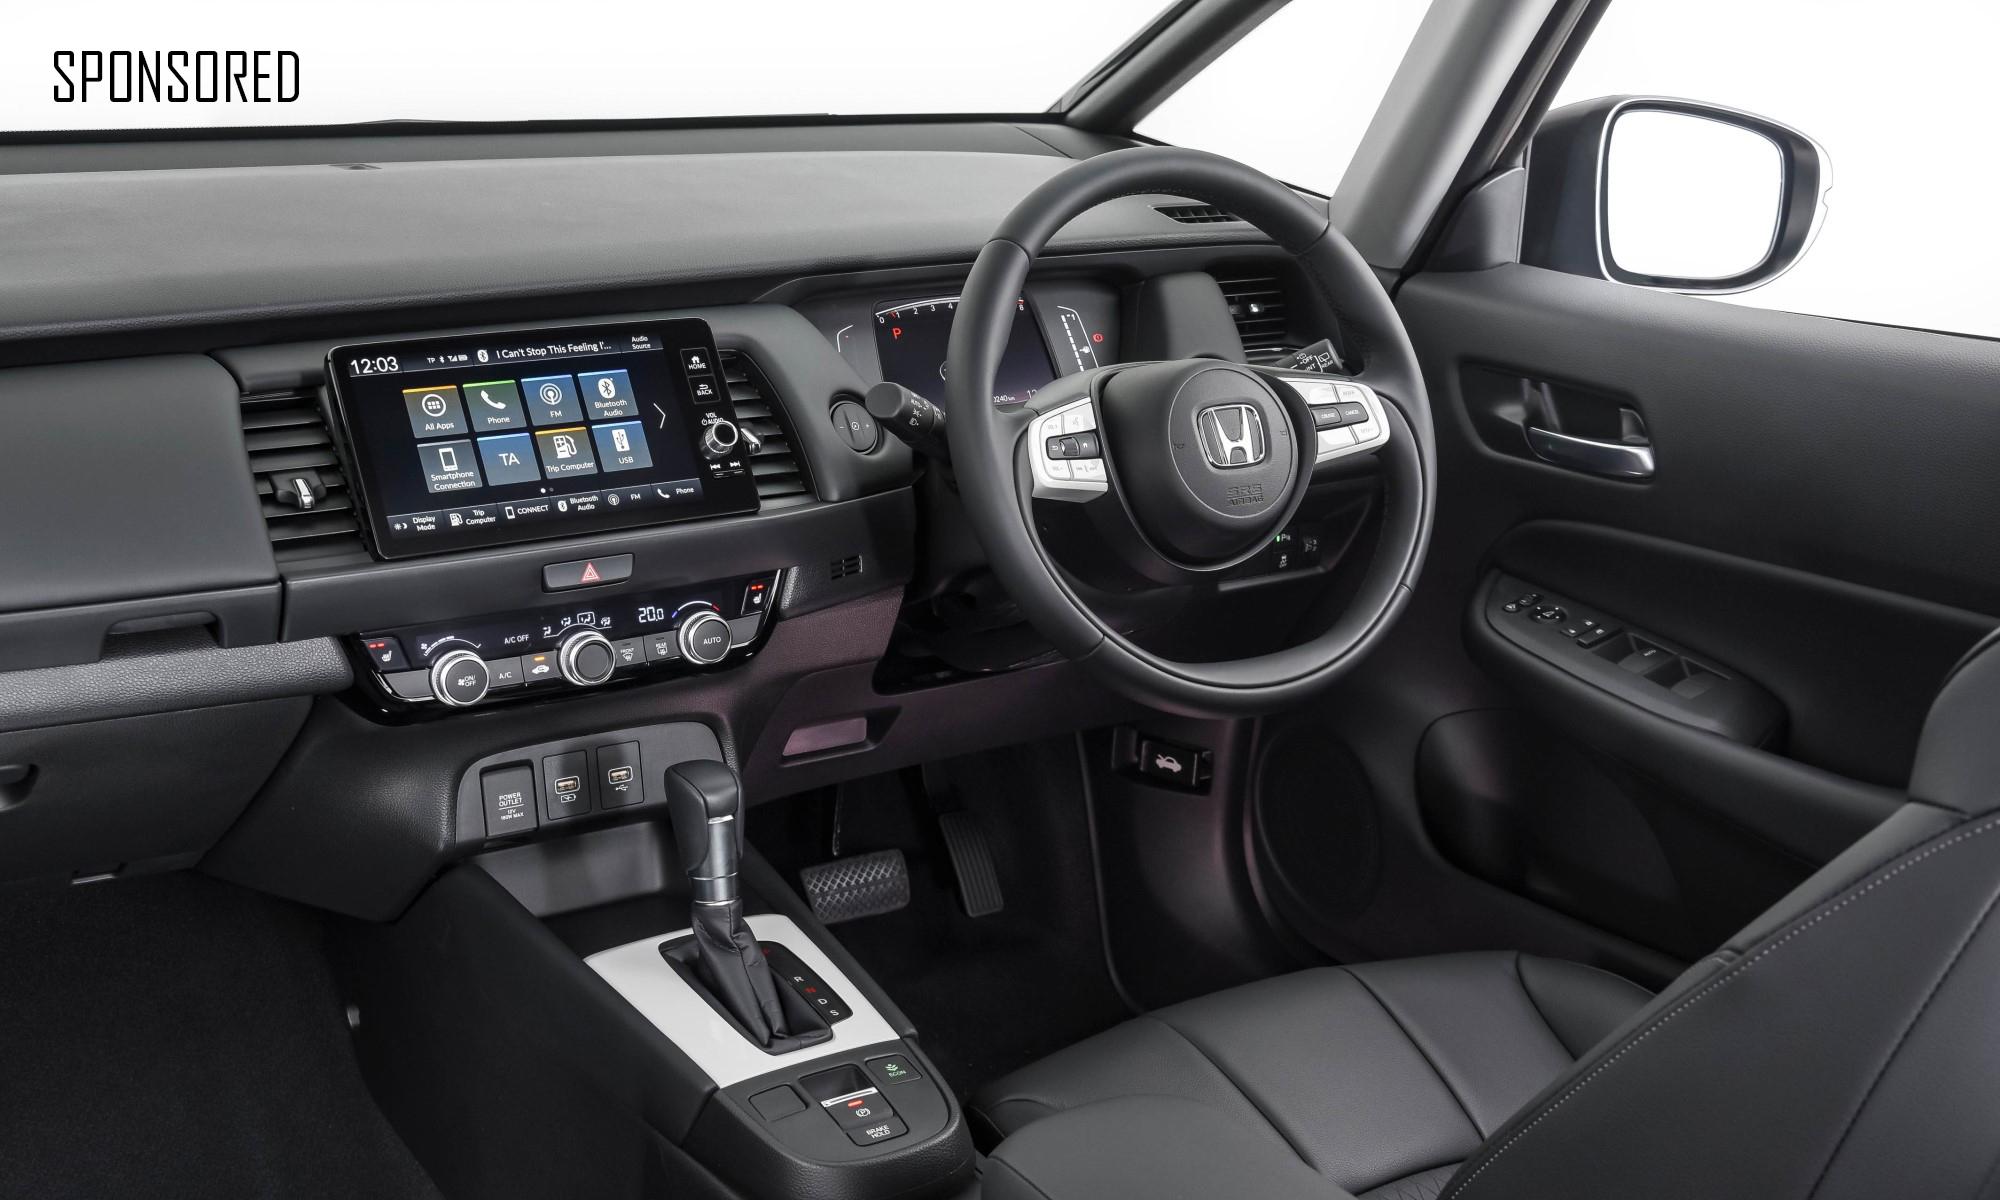 New Honda Fit interior